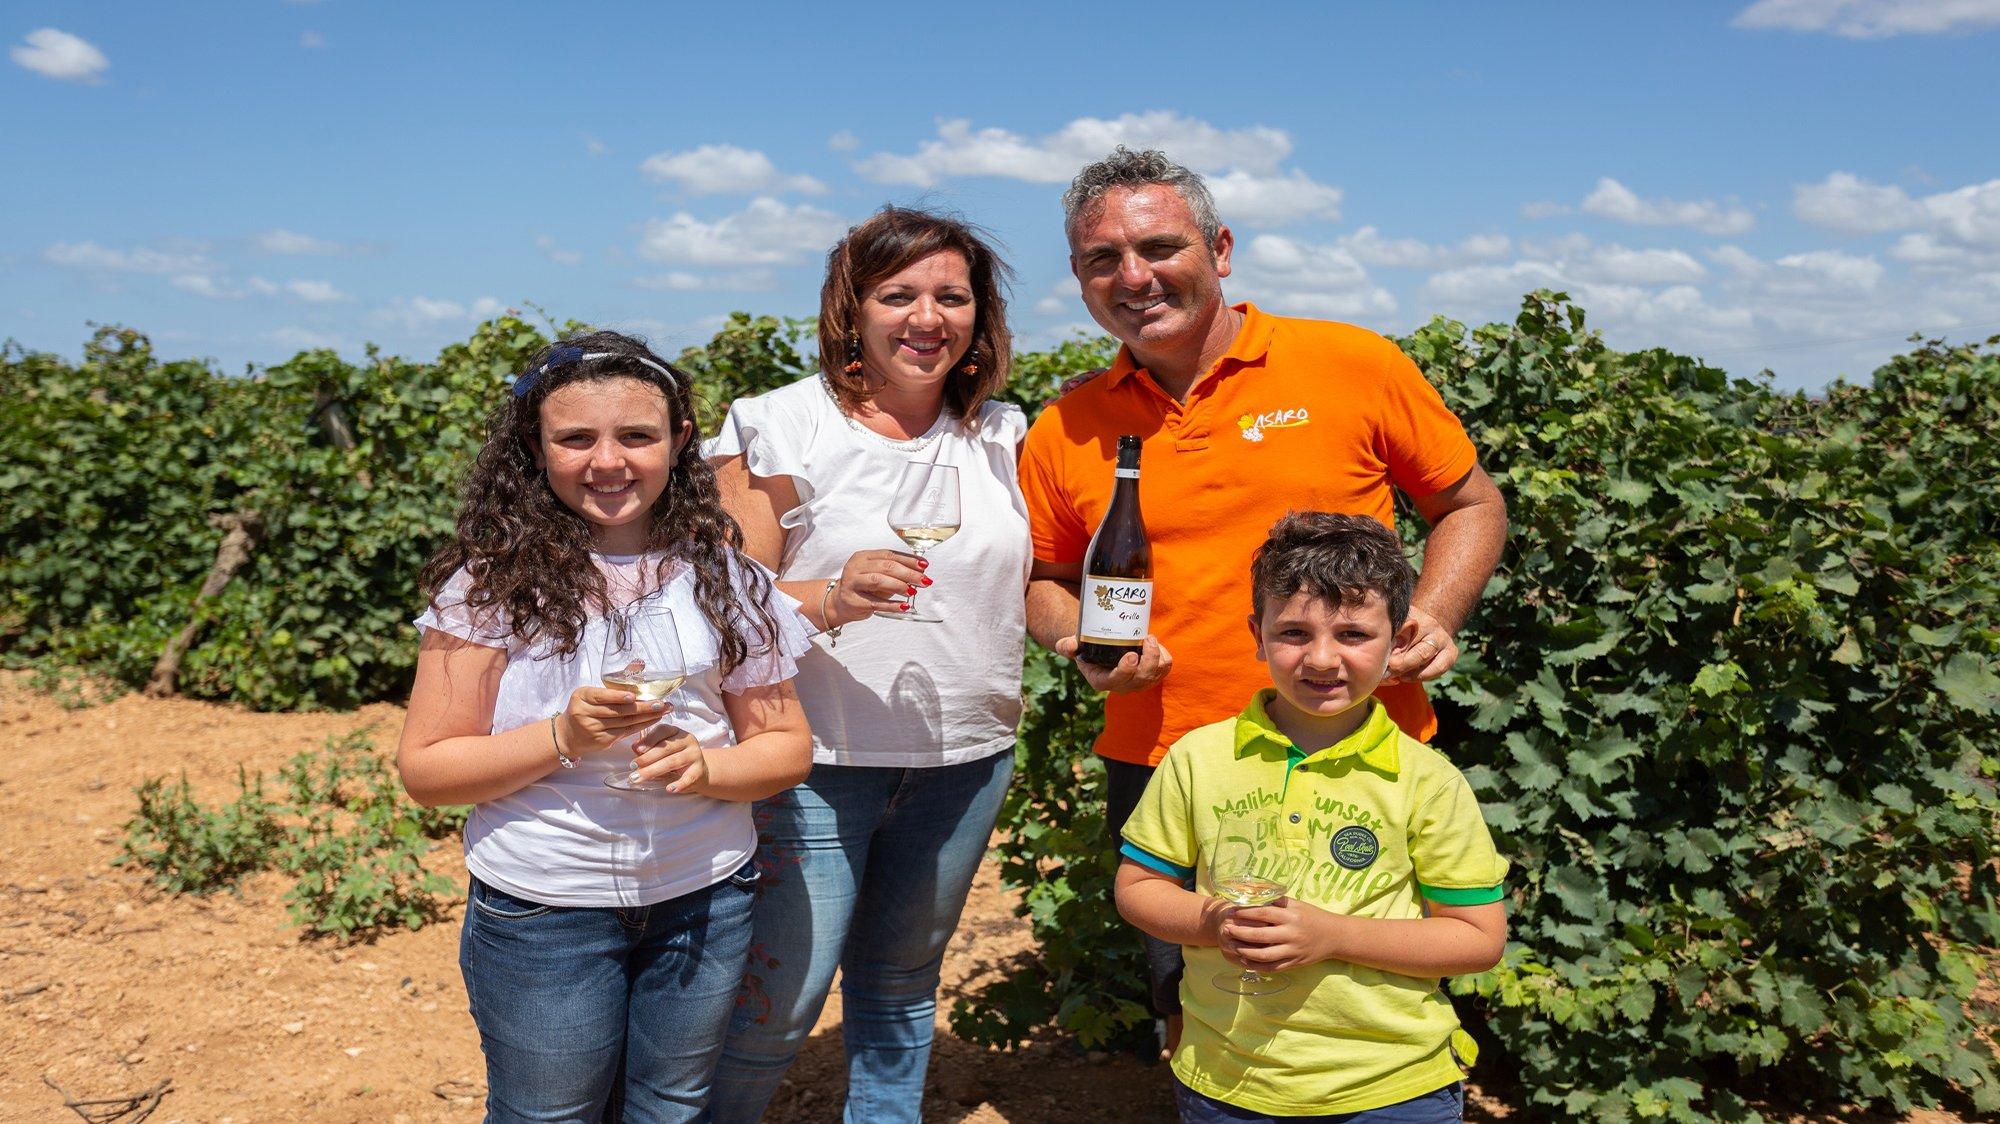 vino-vigneto-famiglia2